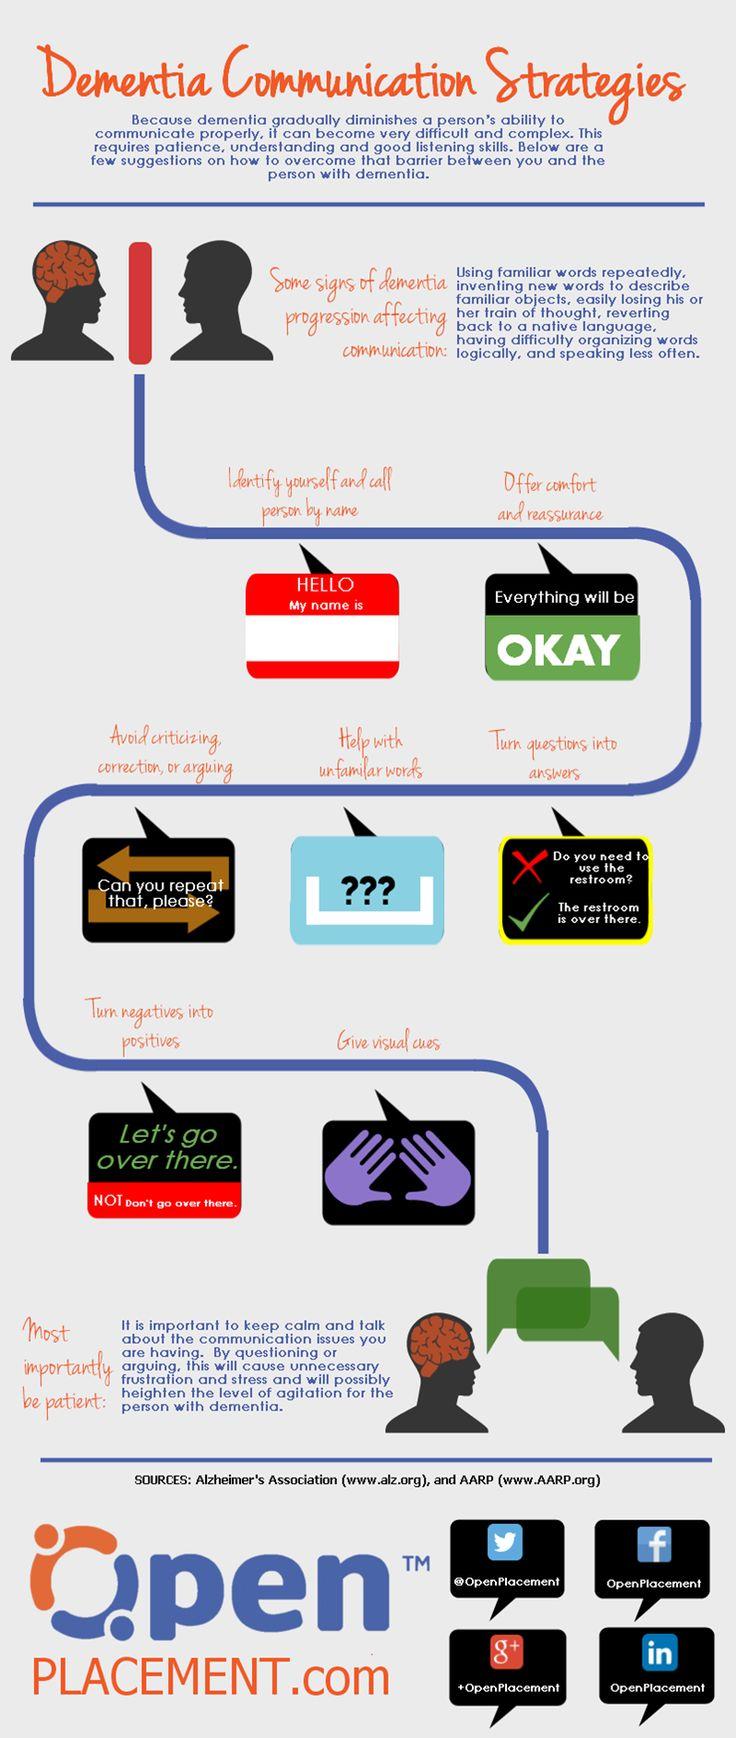 Dementia Communication Strategies infographic. dementia